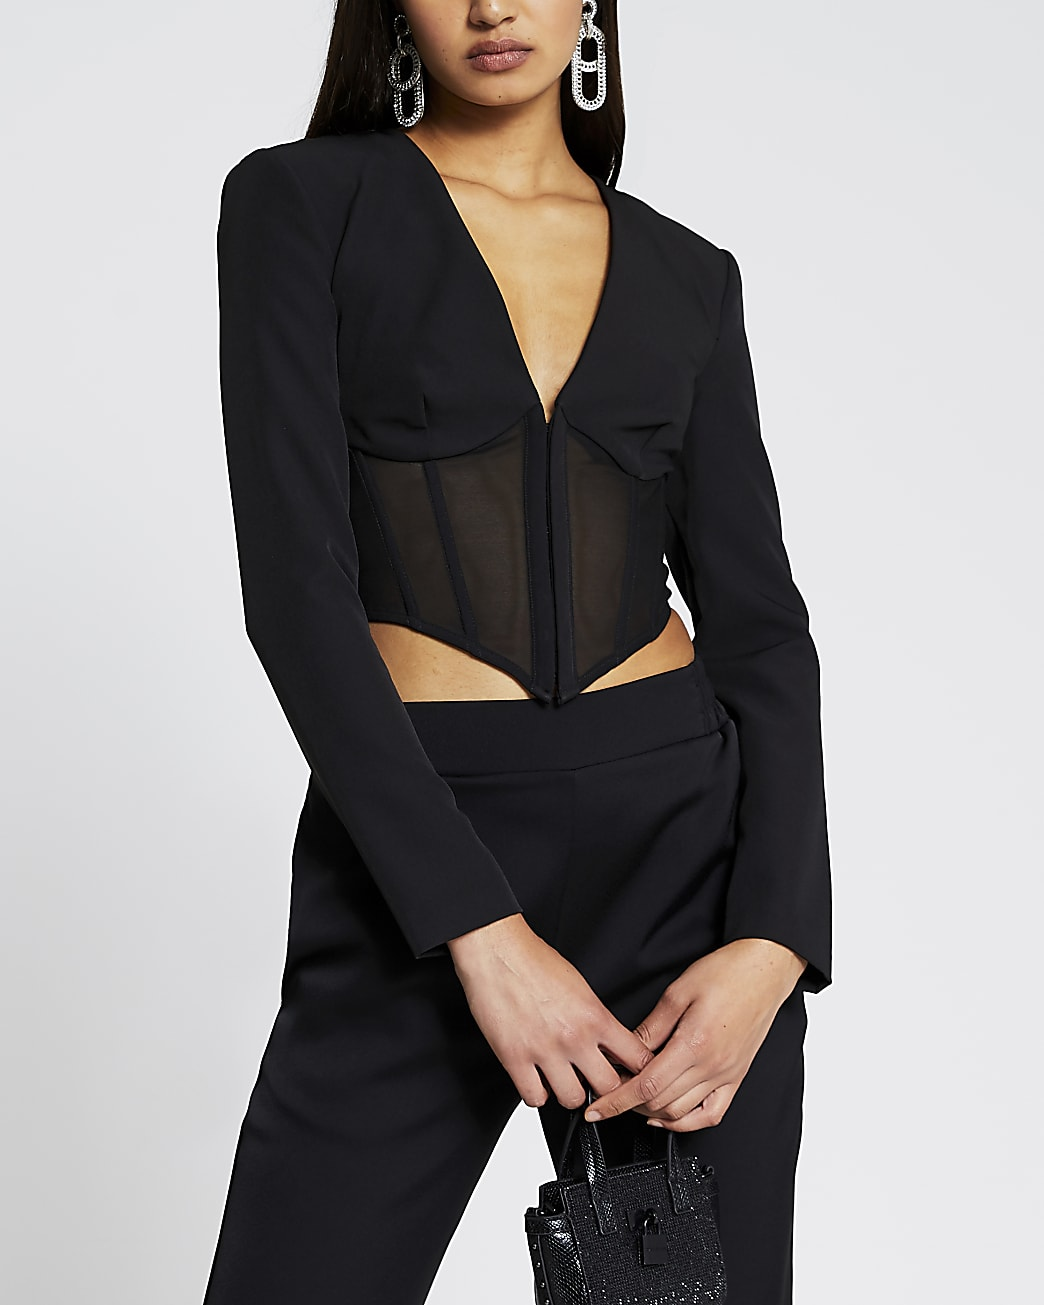 Black long sleeve corset mesh top